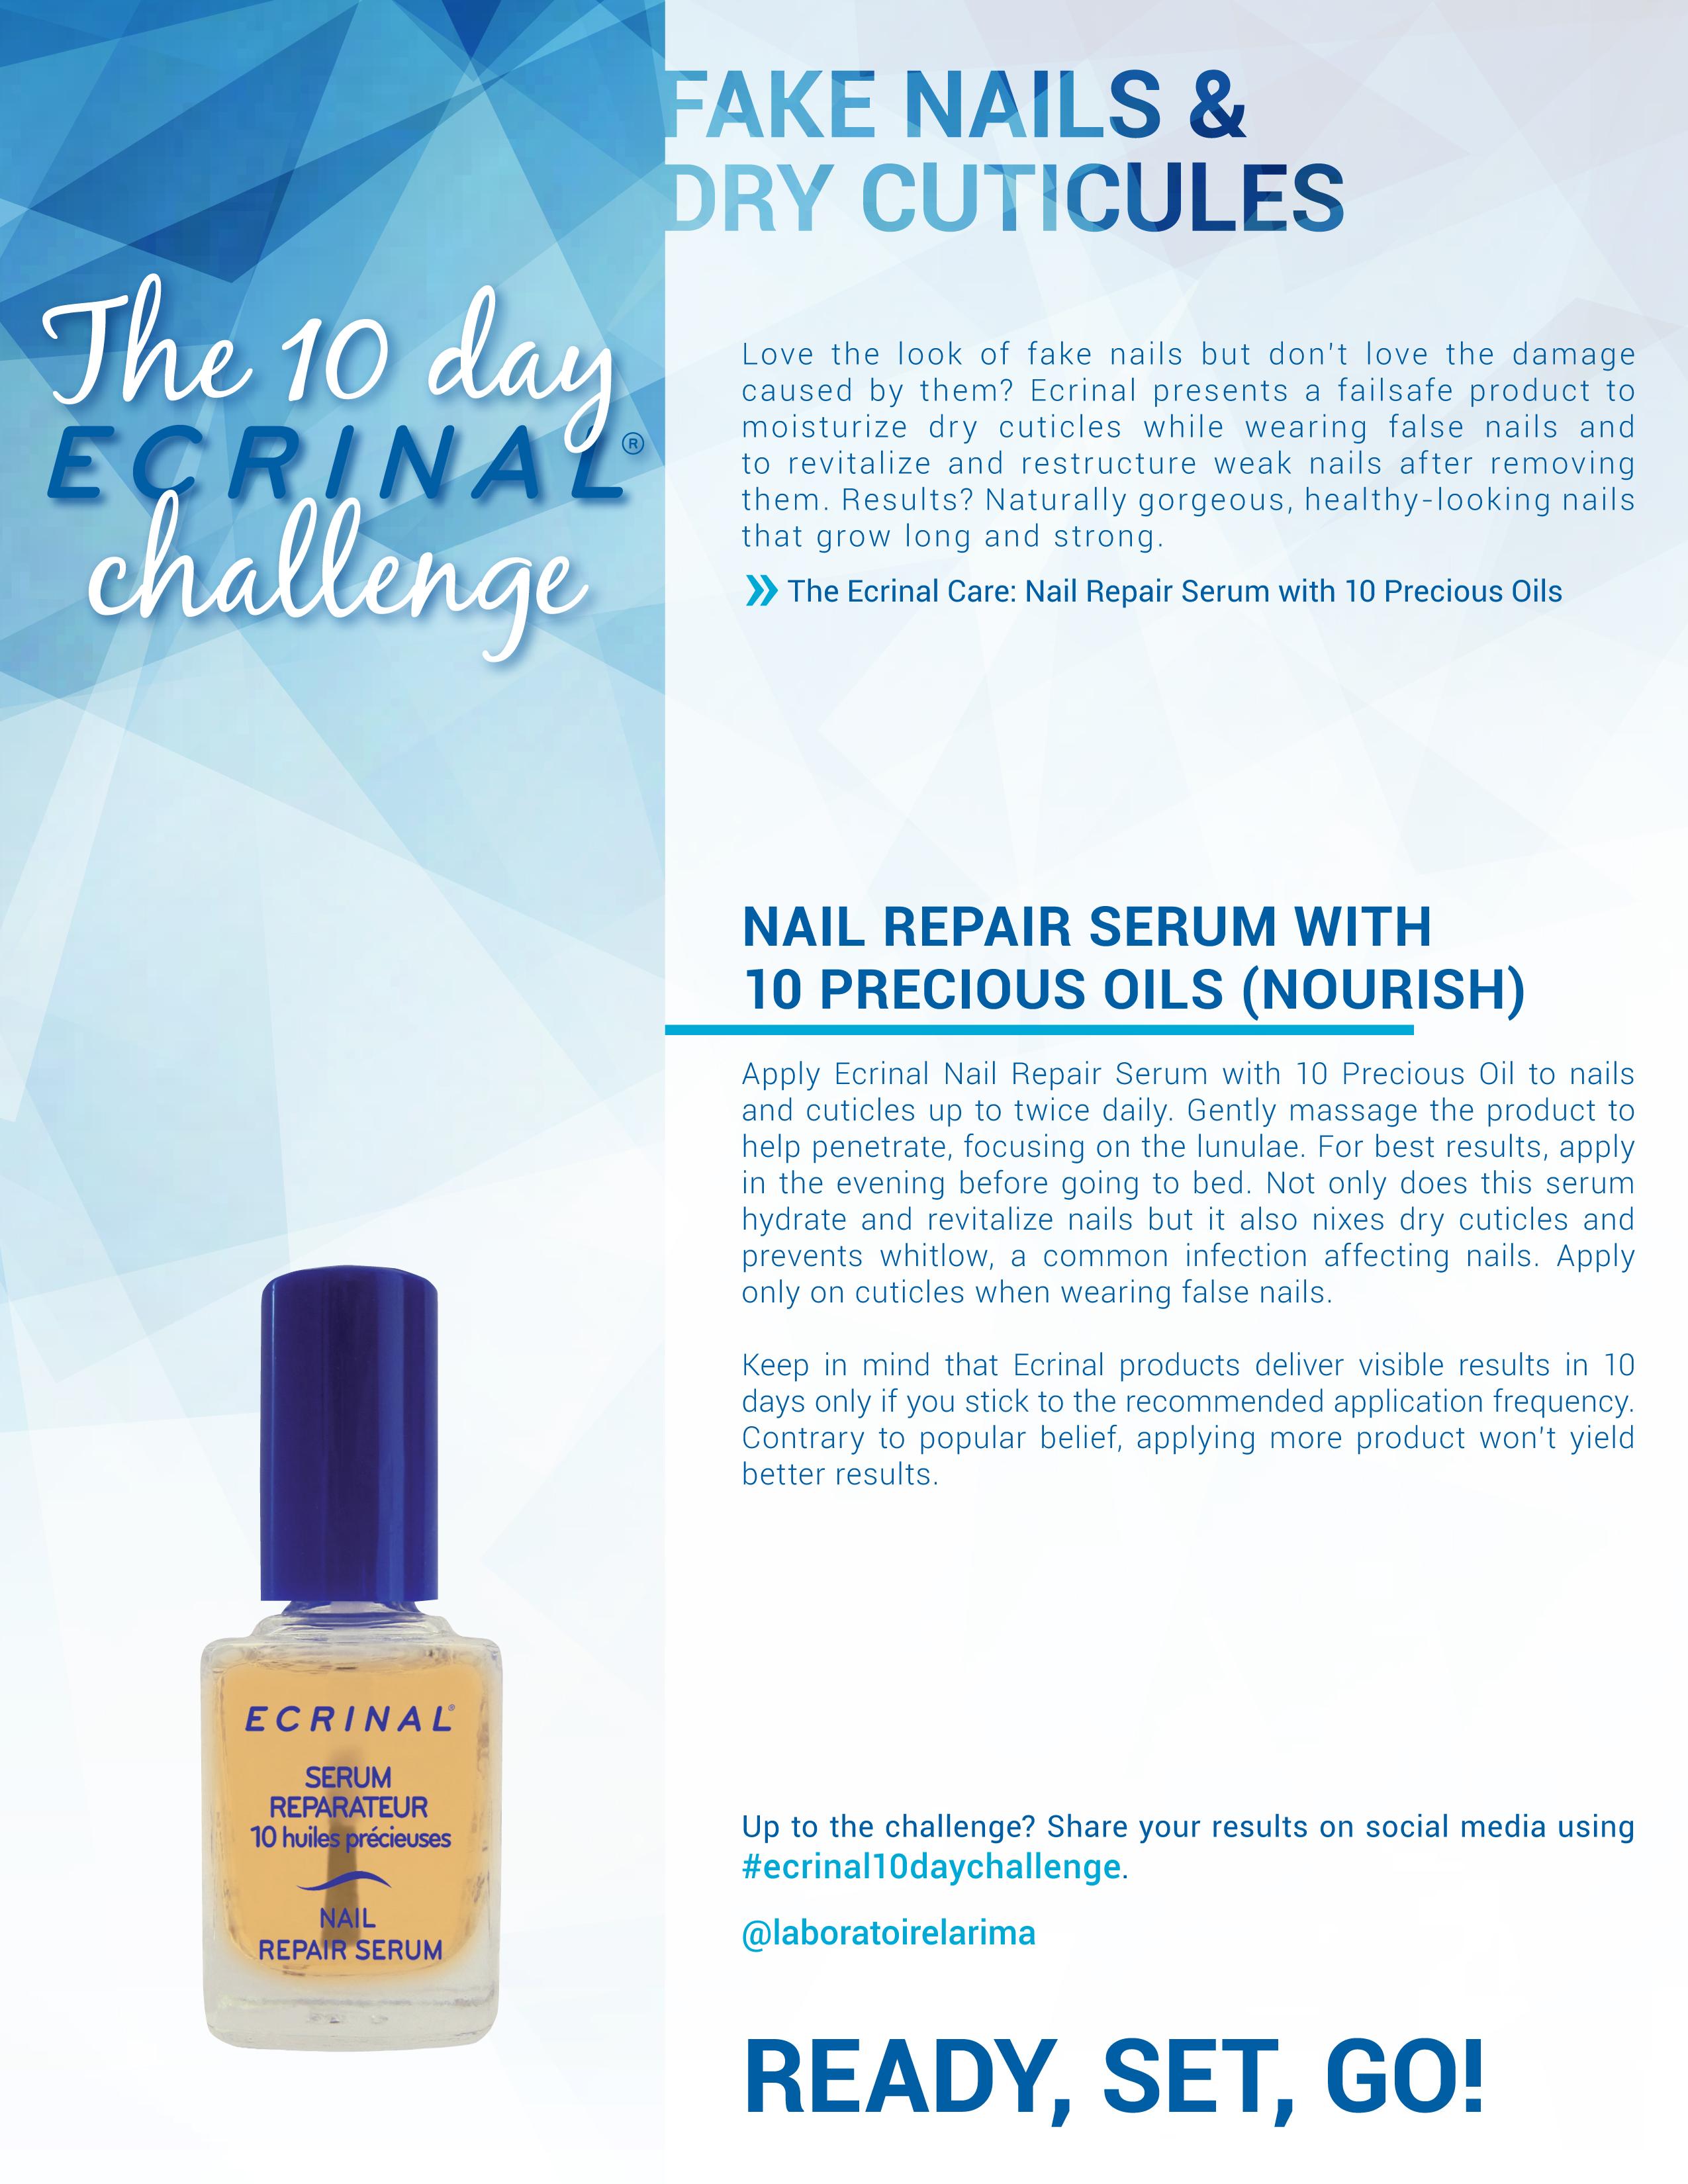 Ecrinal 10 days Challenge False Nails Dry Cuticles